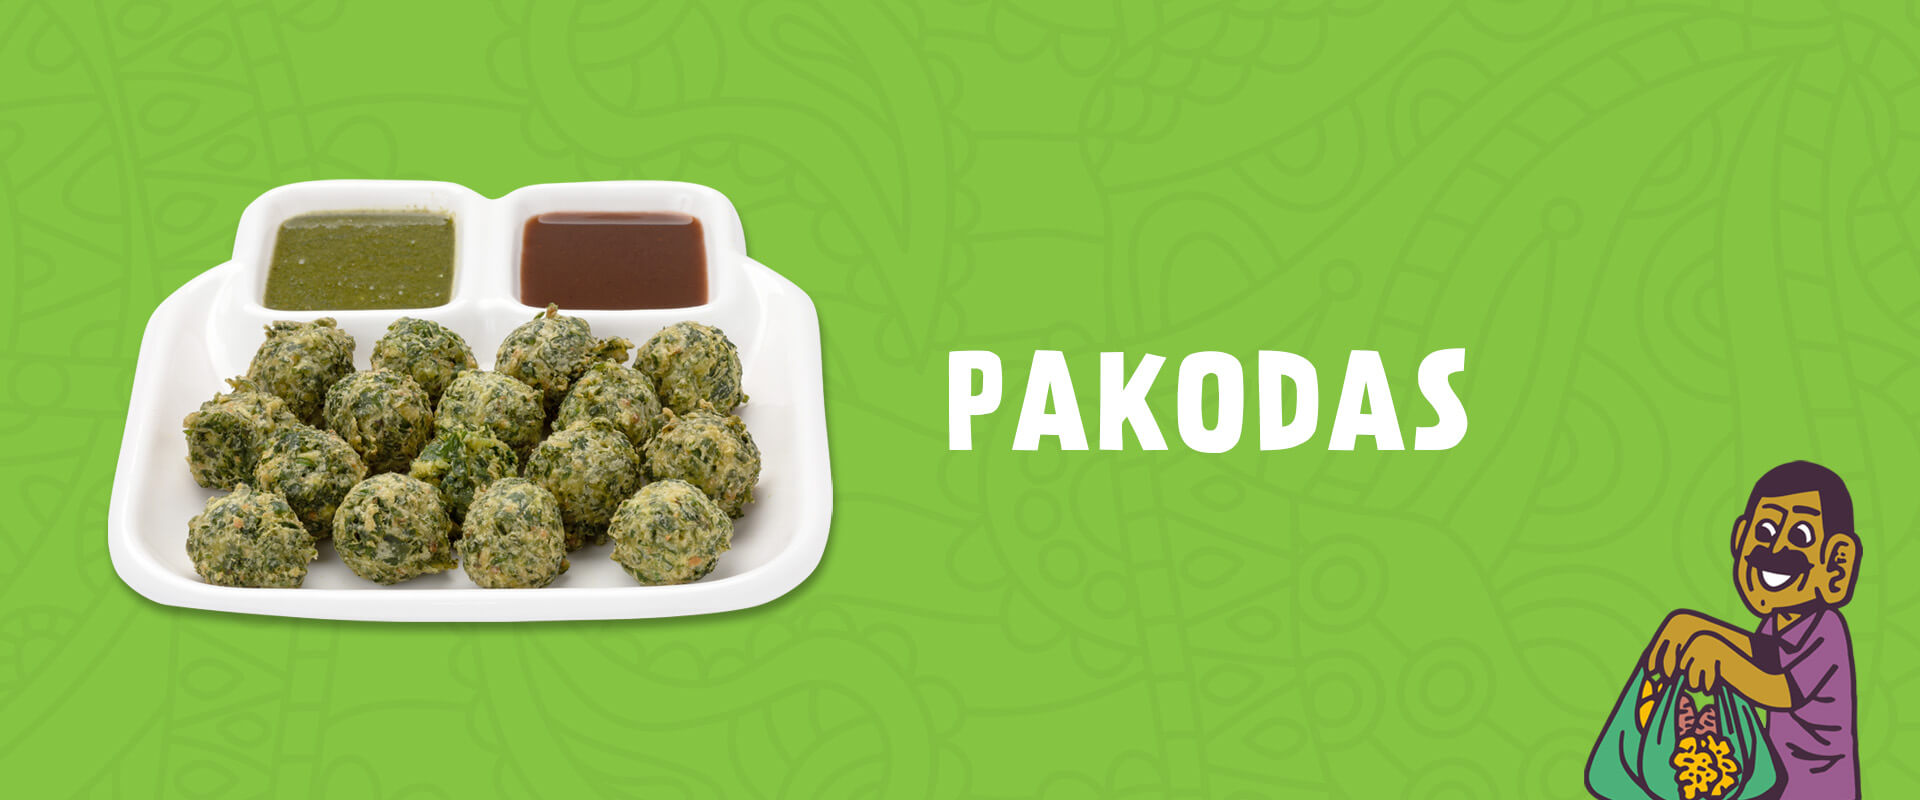 Crispy Pakodas (vegetable fritters)